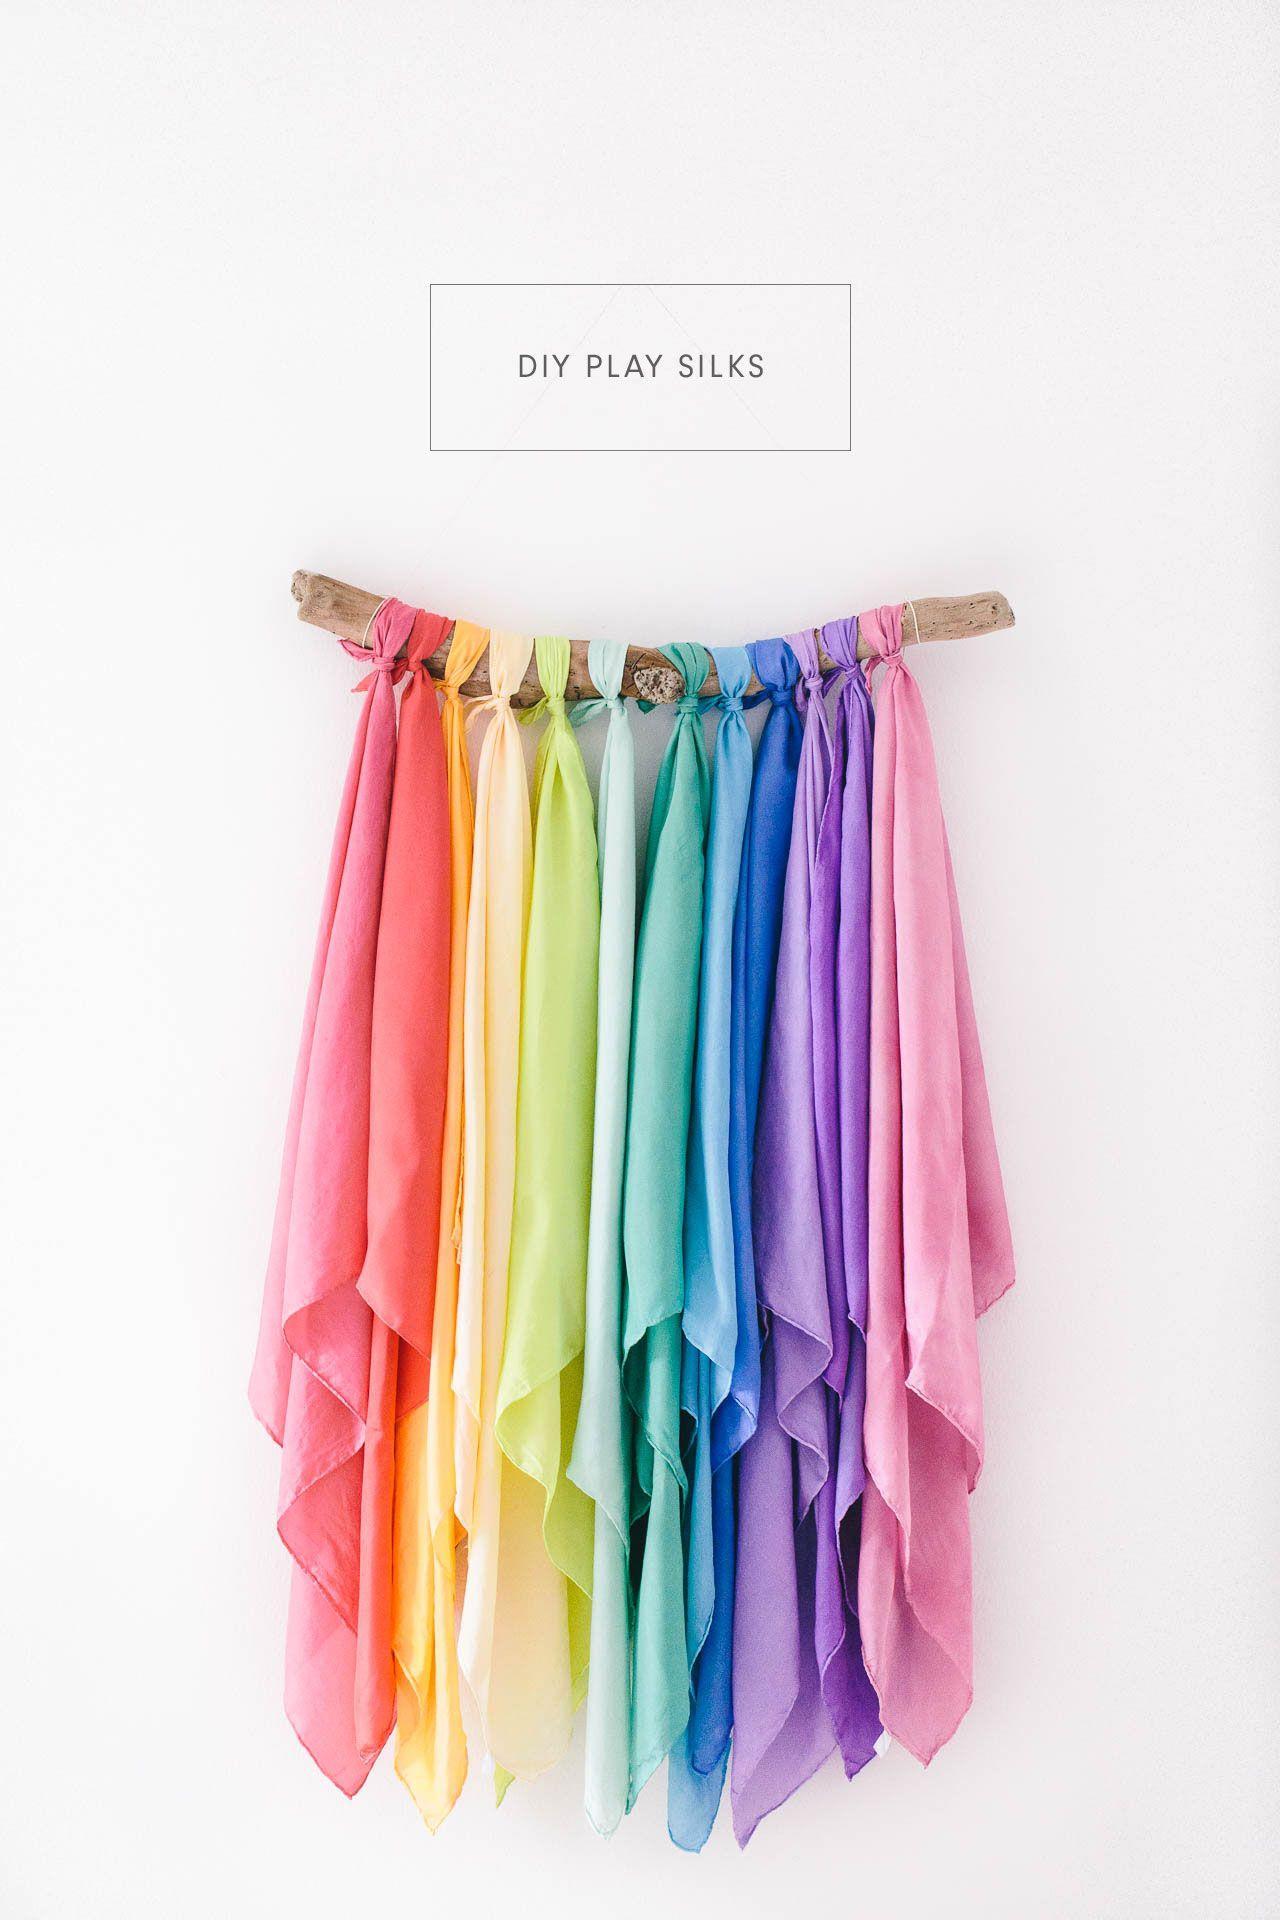 Diy Play Silks Travel Toys Diy For Kids Waldorf Toys